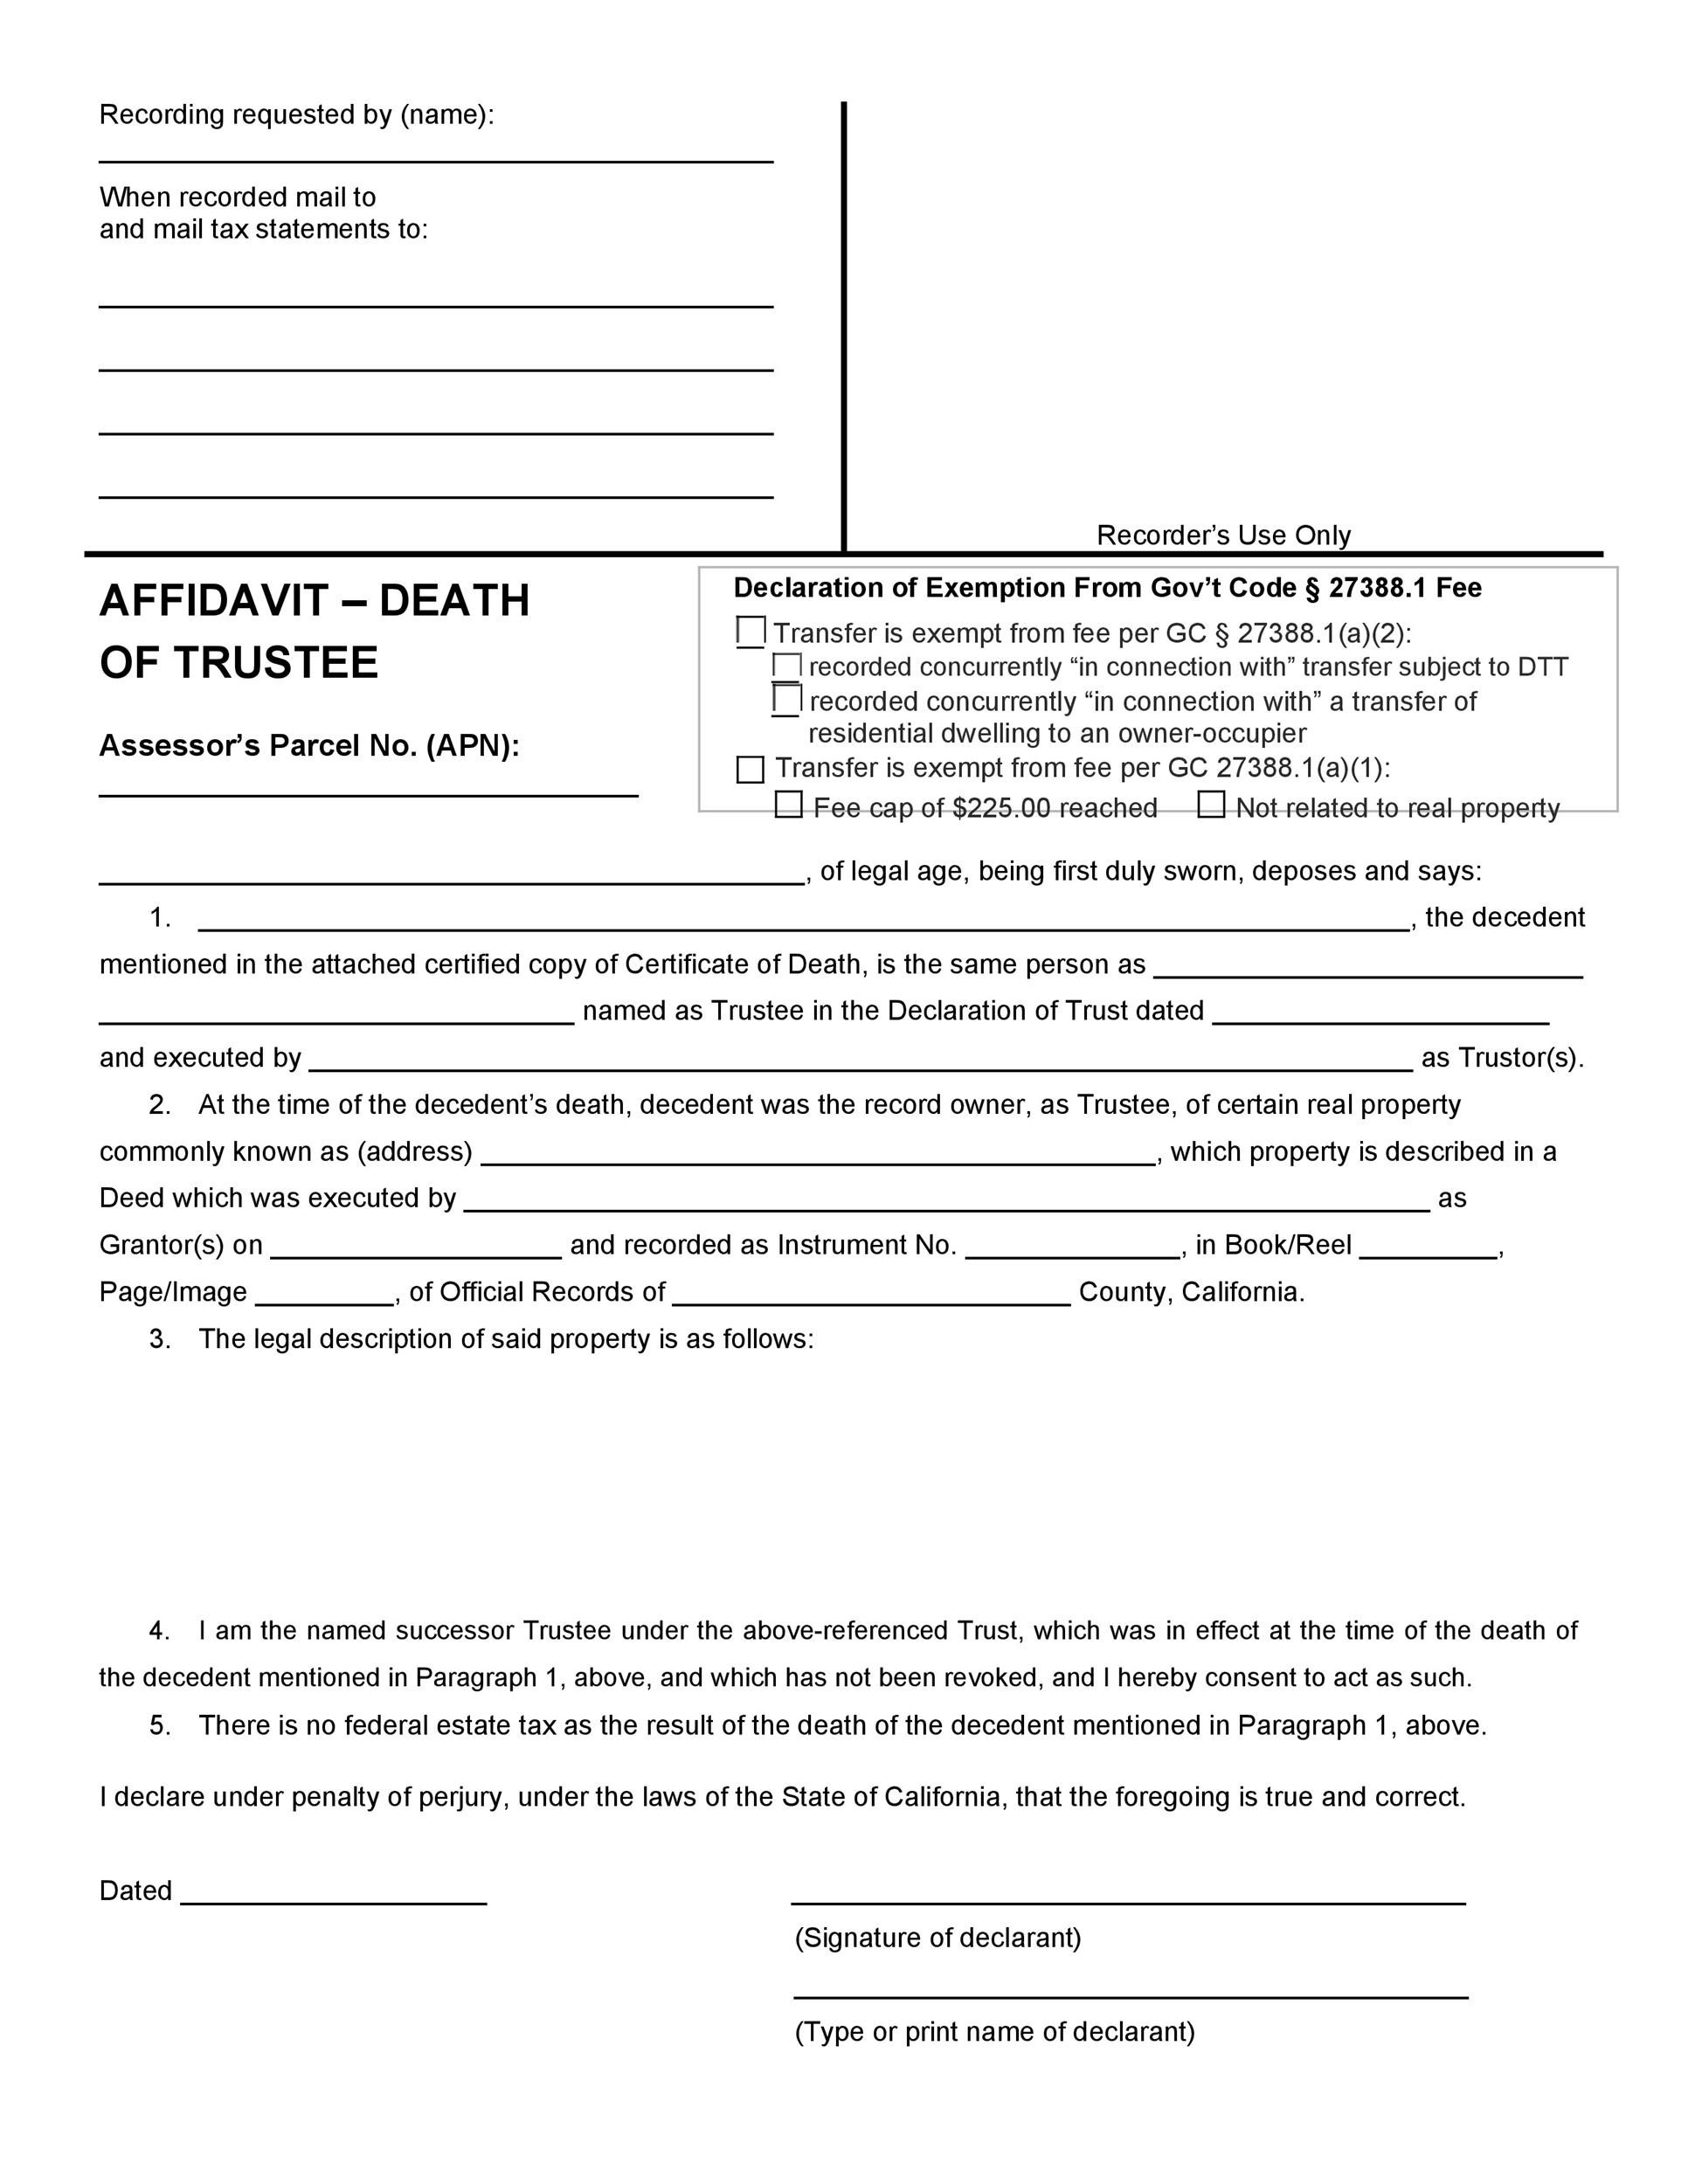 Free affidavit of death 02